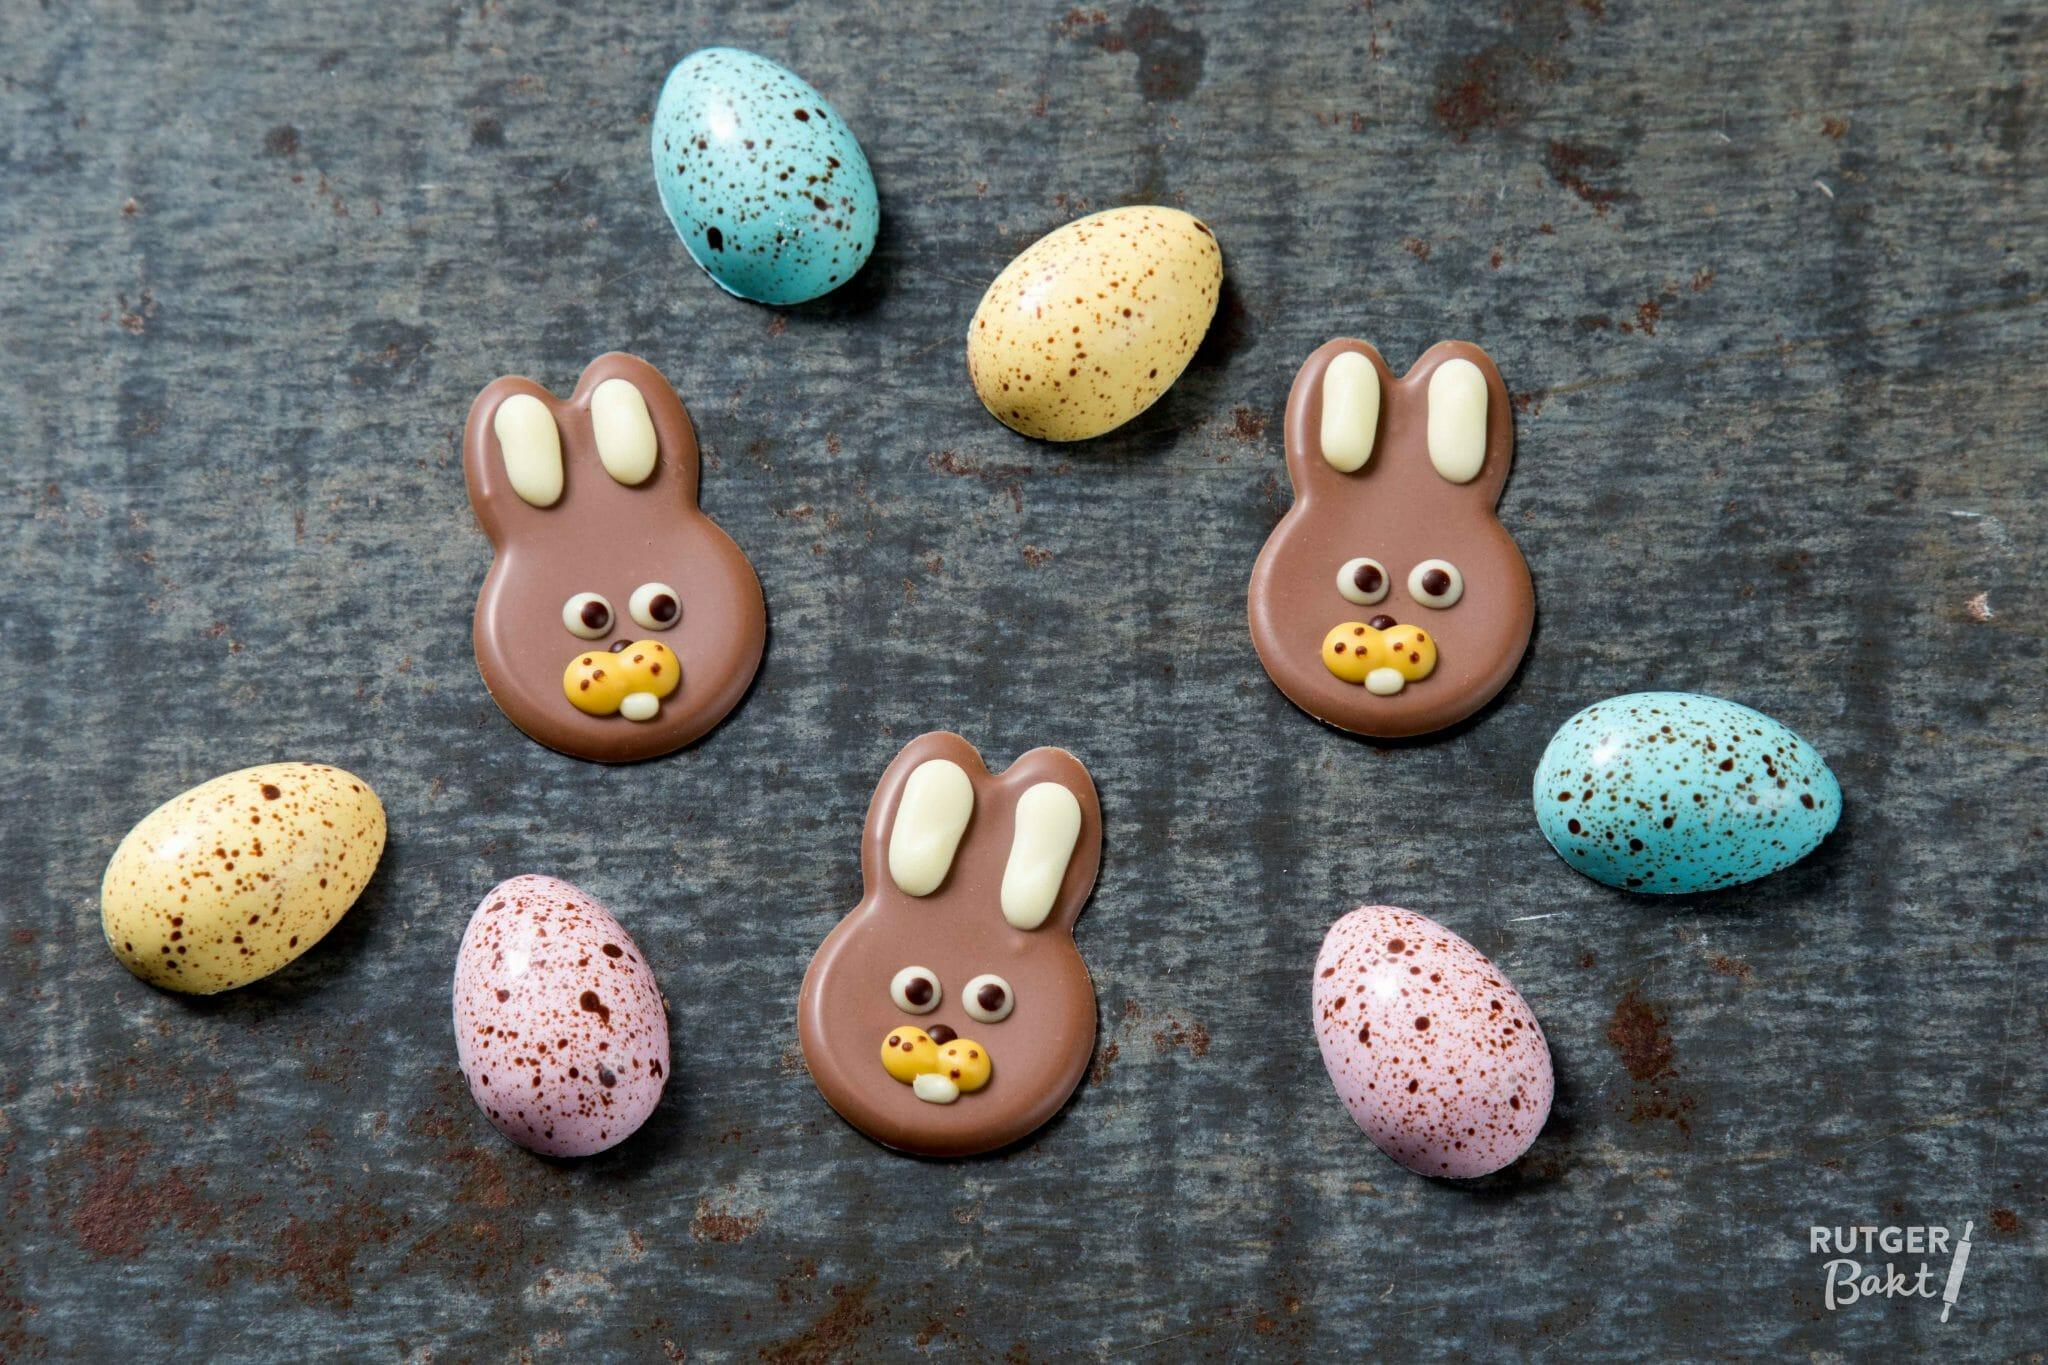 Paas chocolade decoratie rutger bakt for Decoratie chocolade